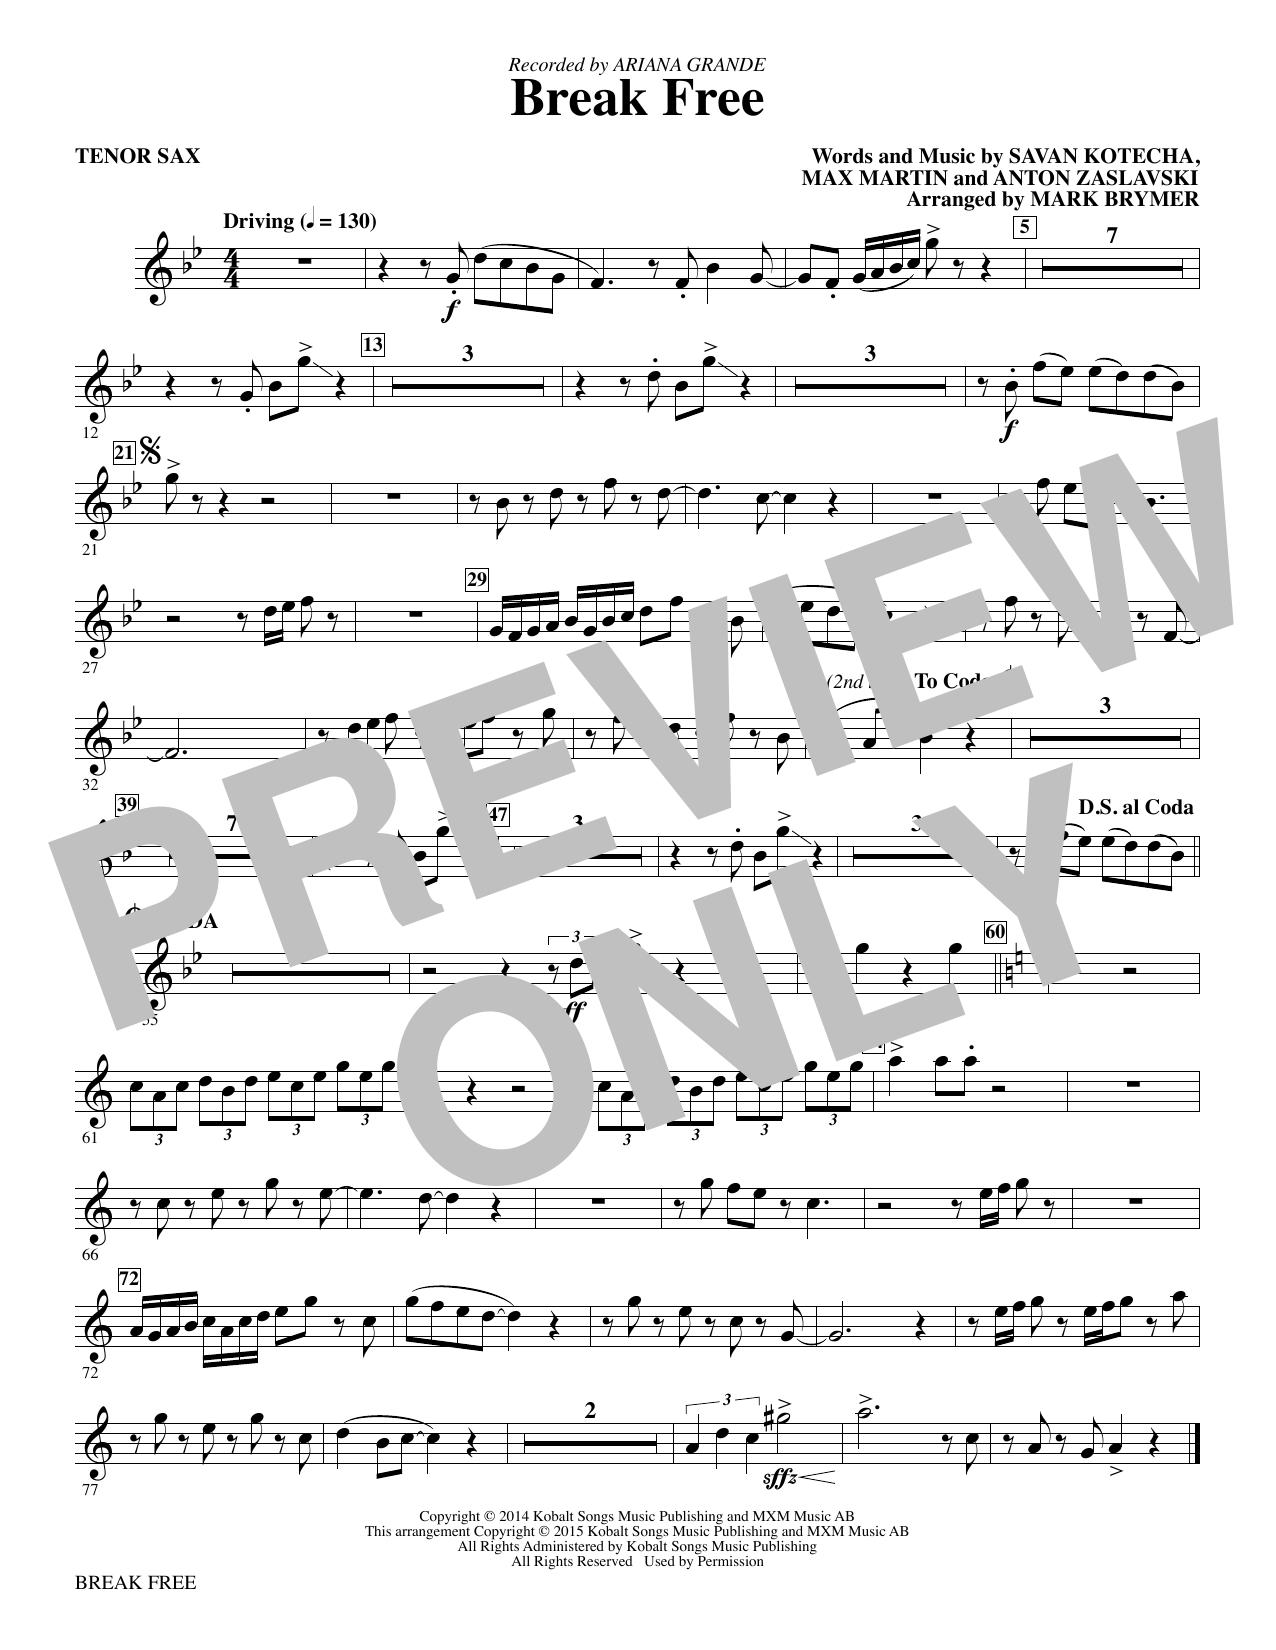 Mark Brymer Break Free - Tenor Saxophone sheet music notes and chords. Download Printable PDF.